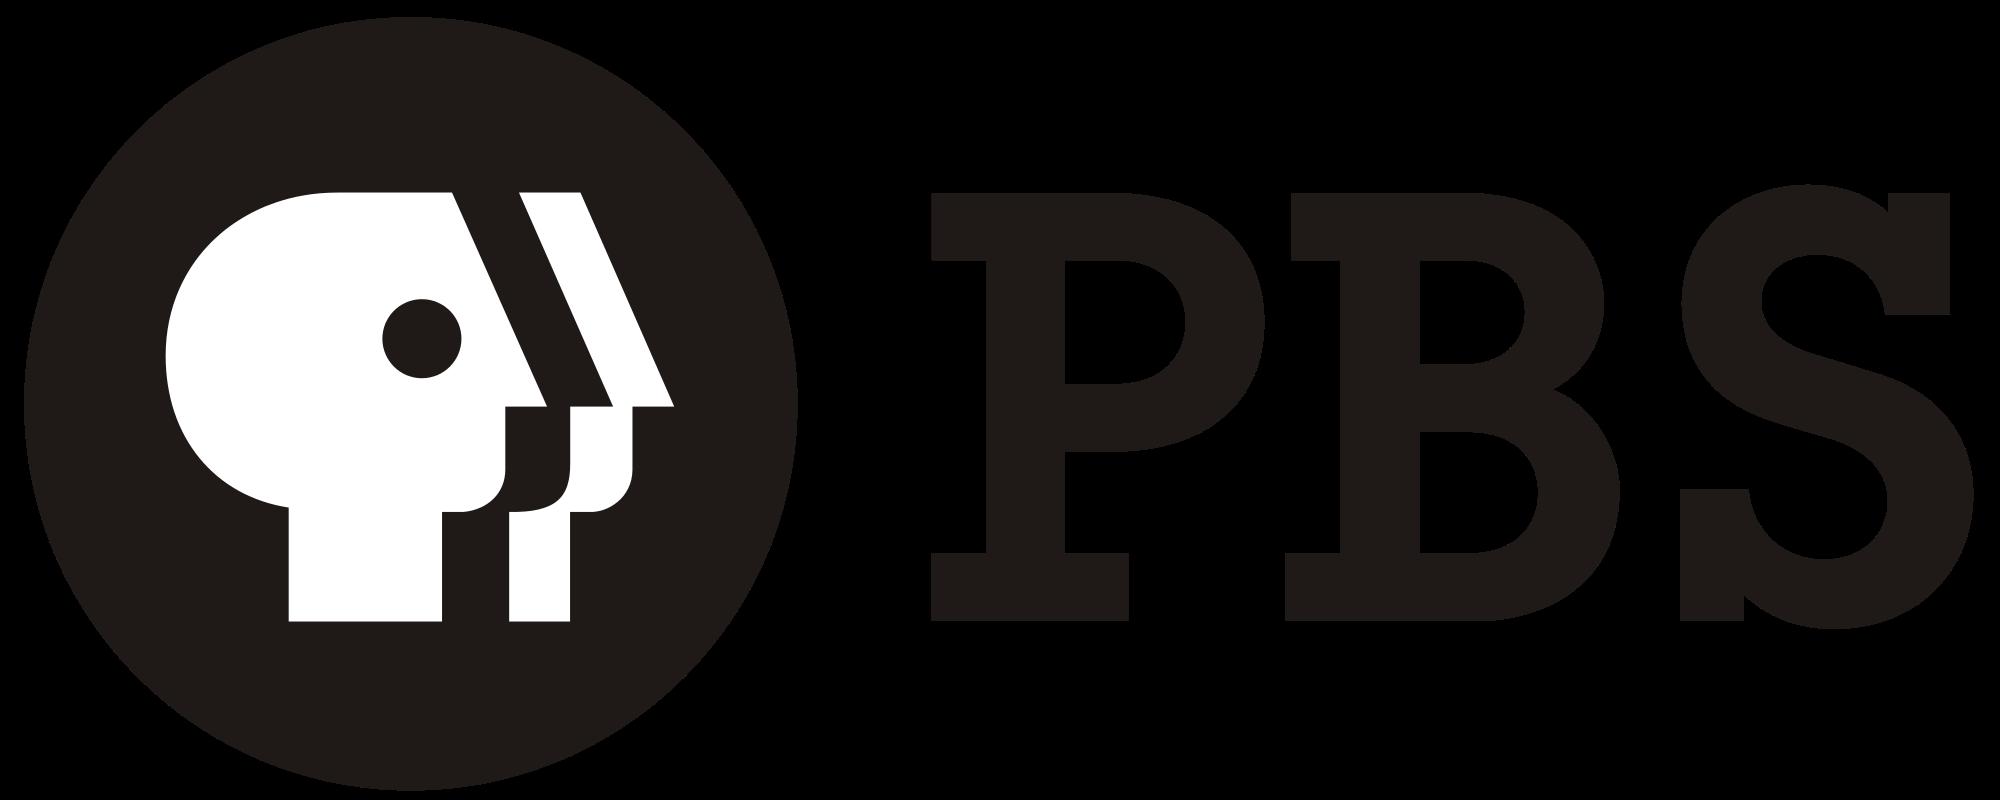 Be an advocate for gpb and public media georgia public broadcasting buycottarizona